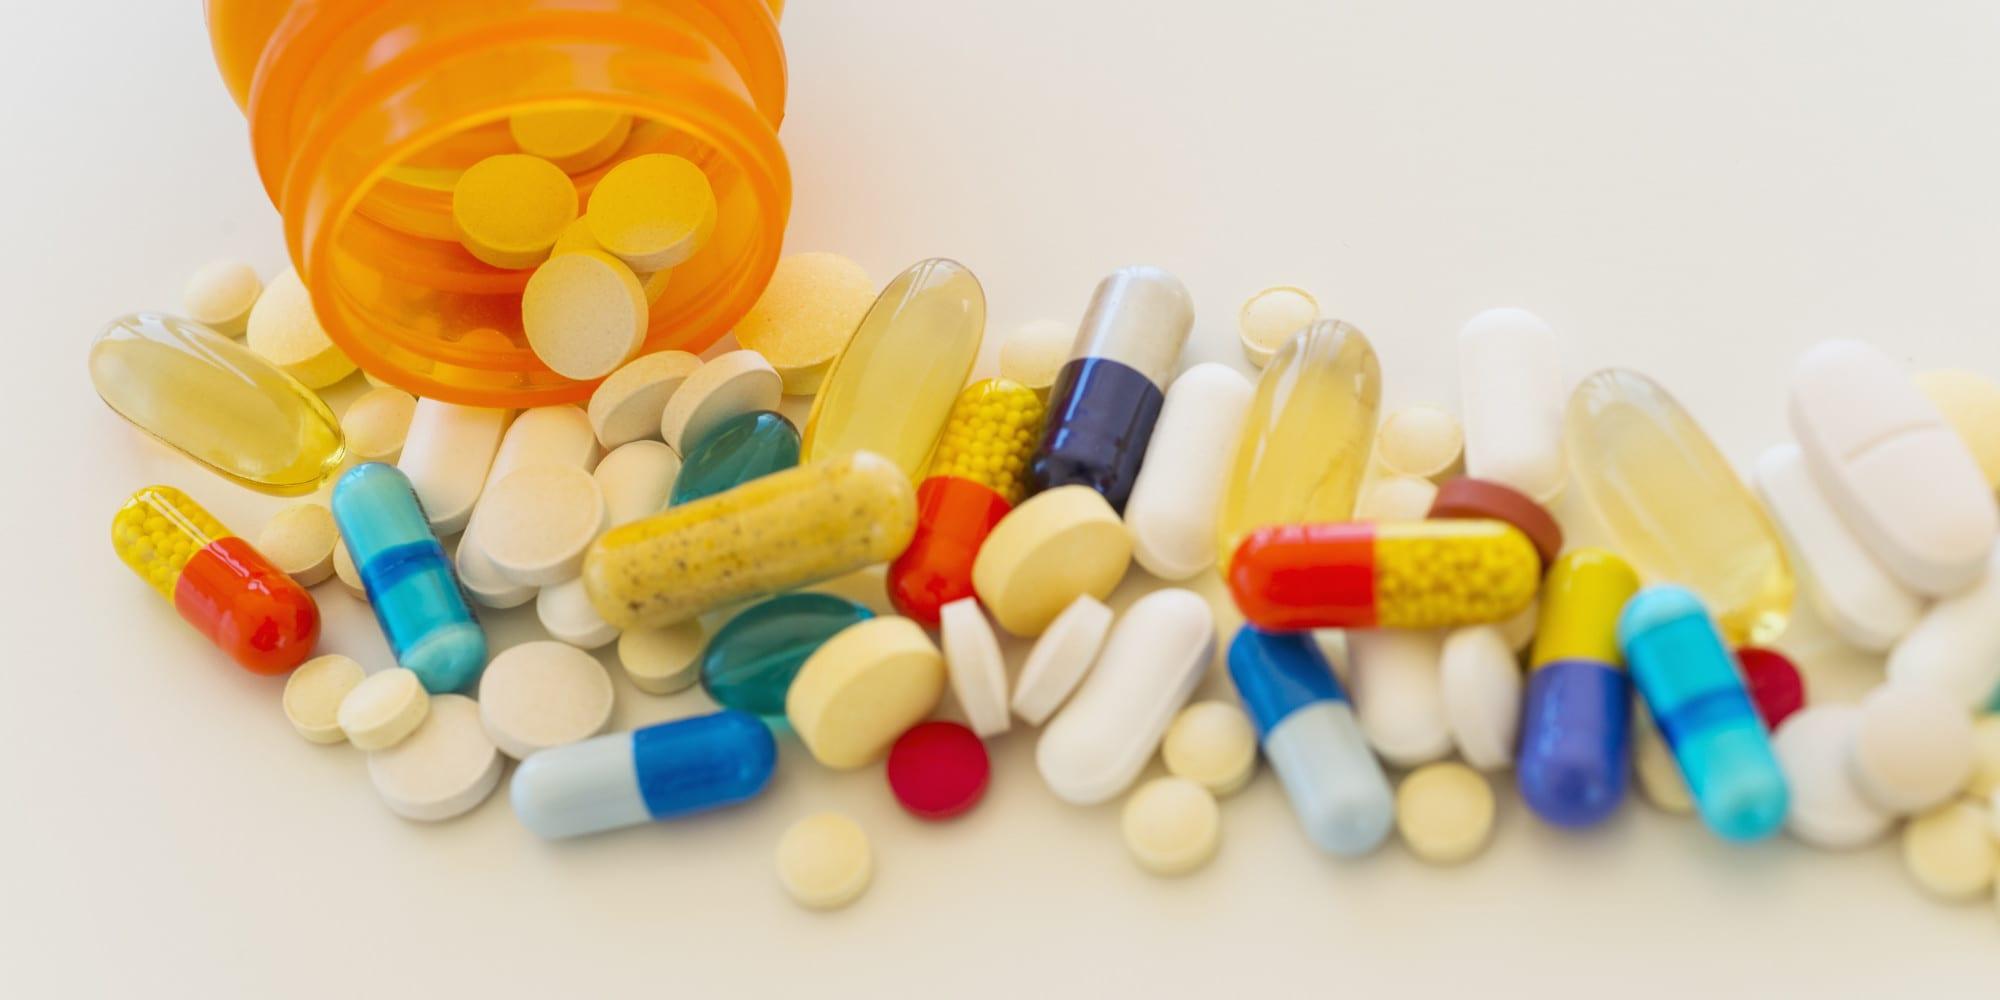 Anti-anxiety pills